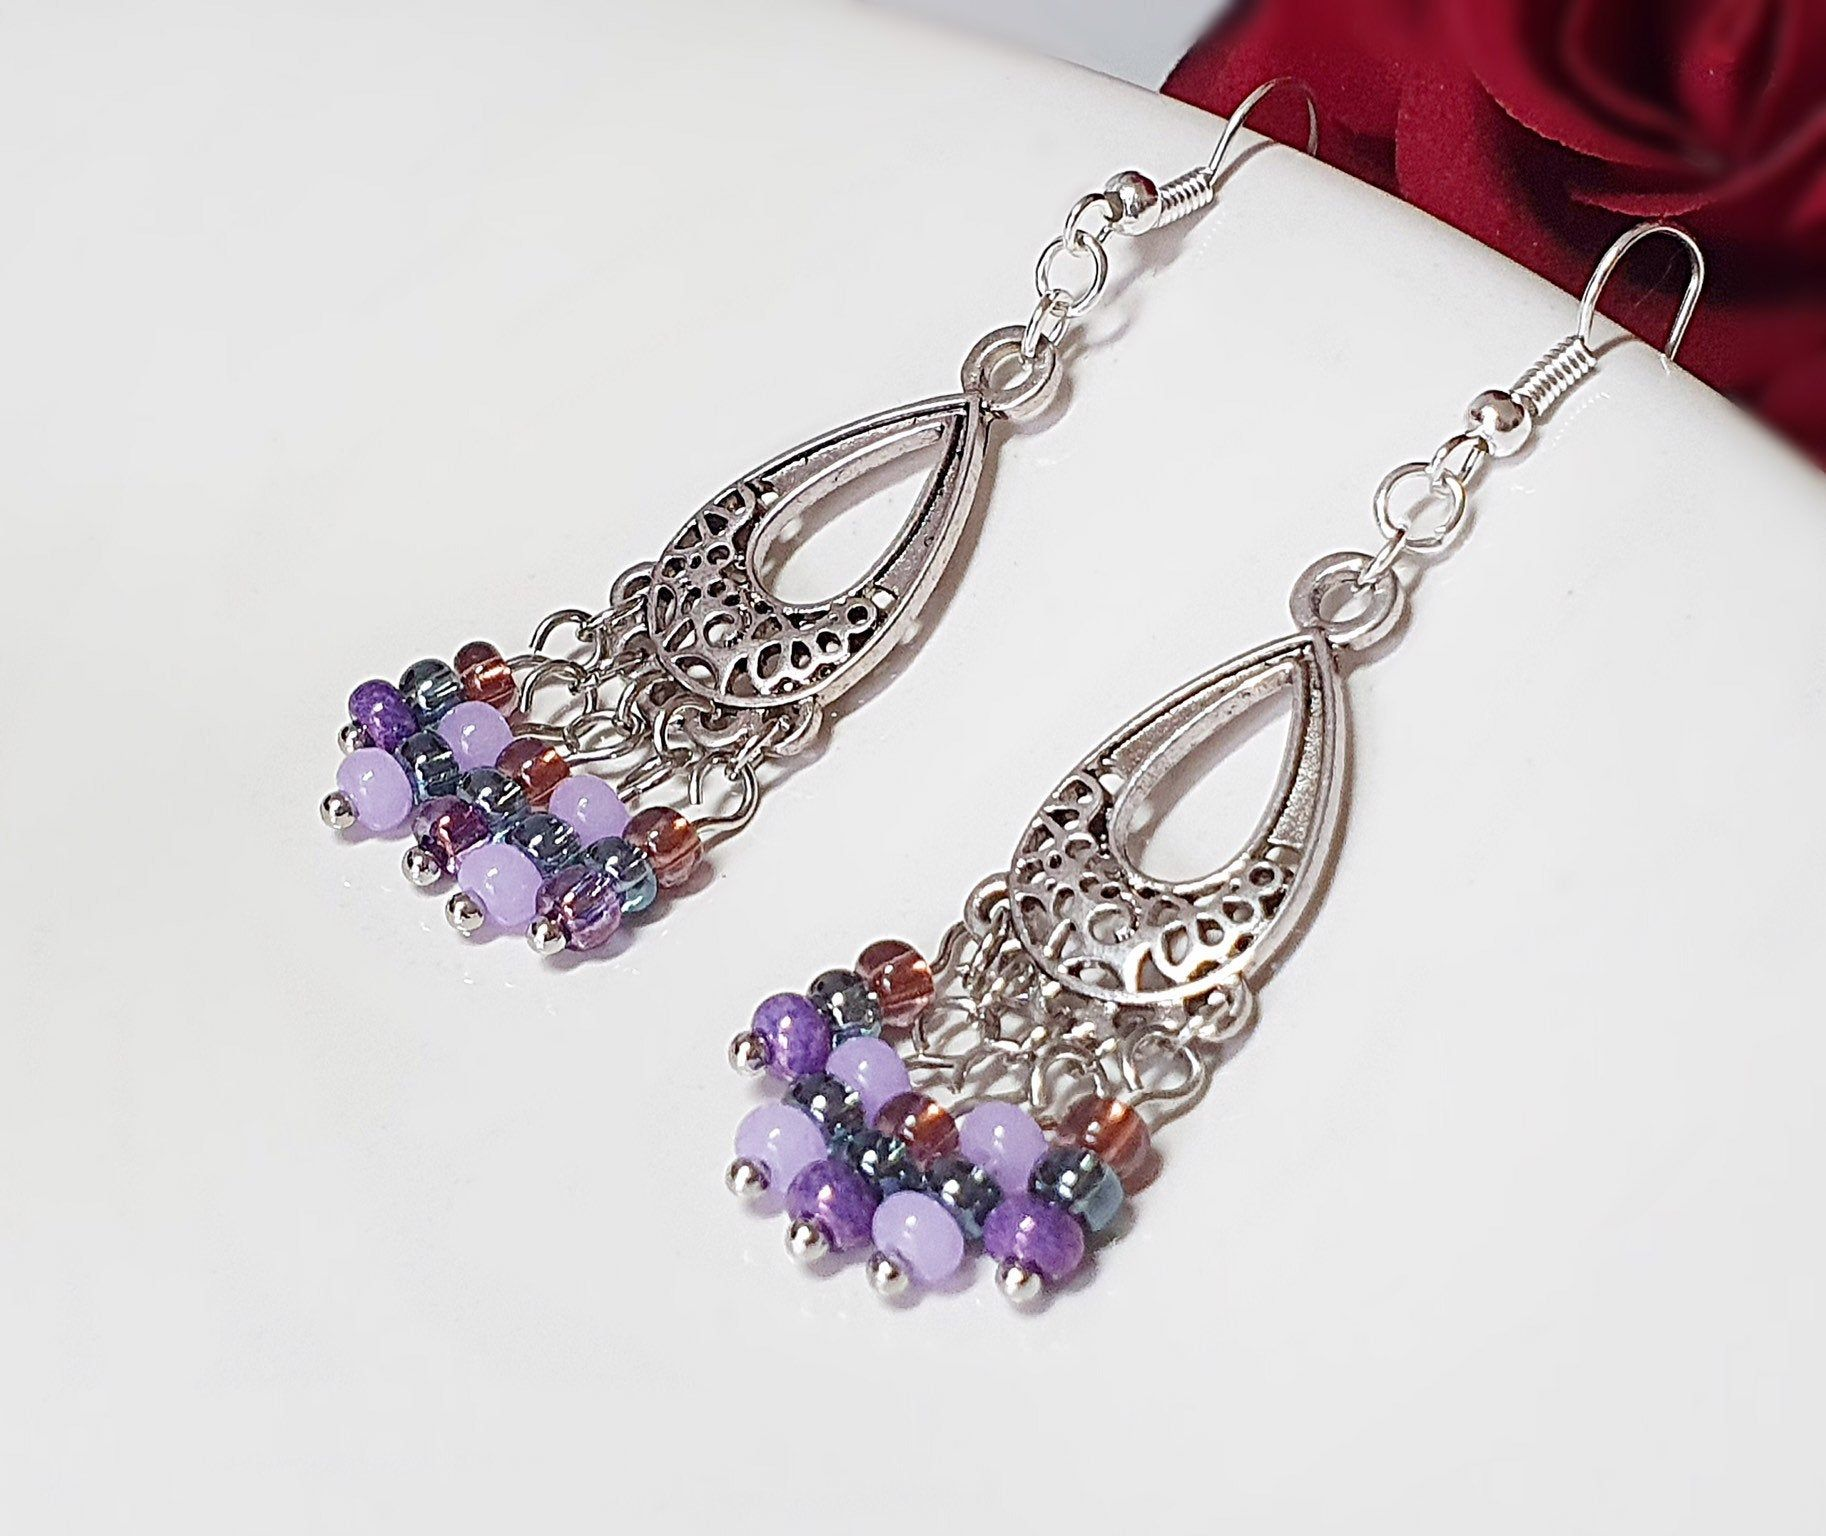 Shimmering Lilac /& Bronze Czech Glass Heart Bracelet Pale Purple Rustic Boho Bracelet